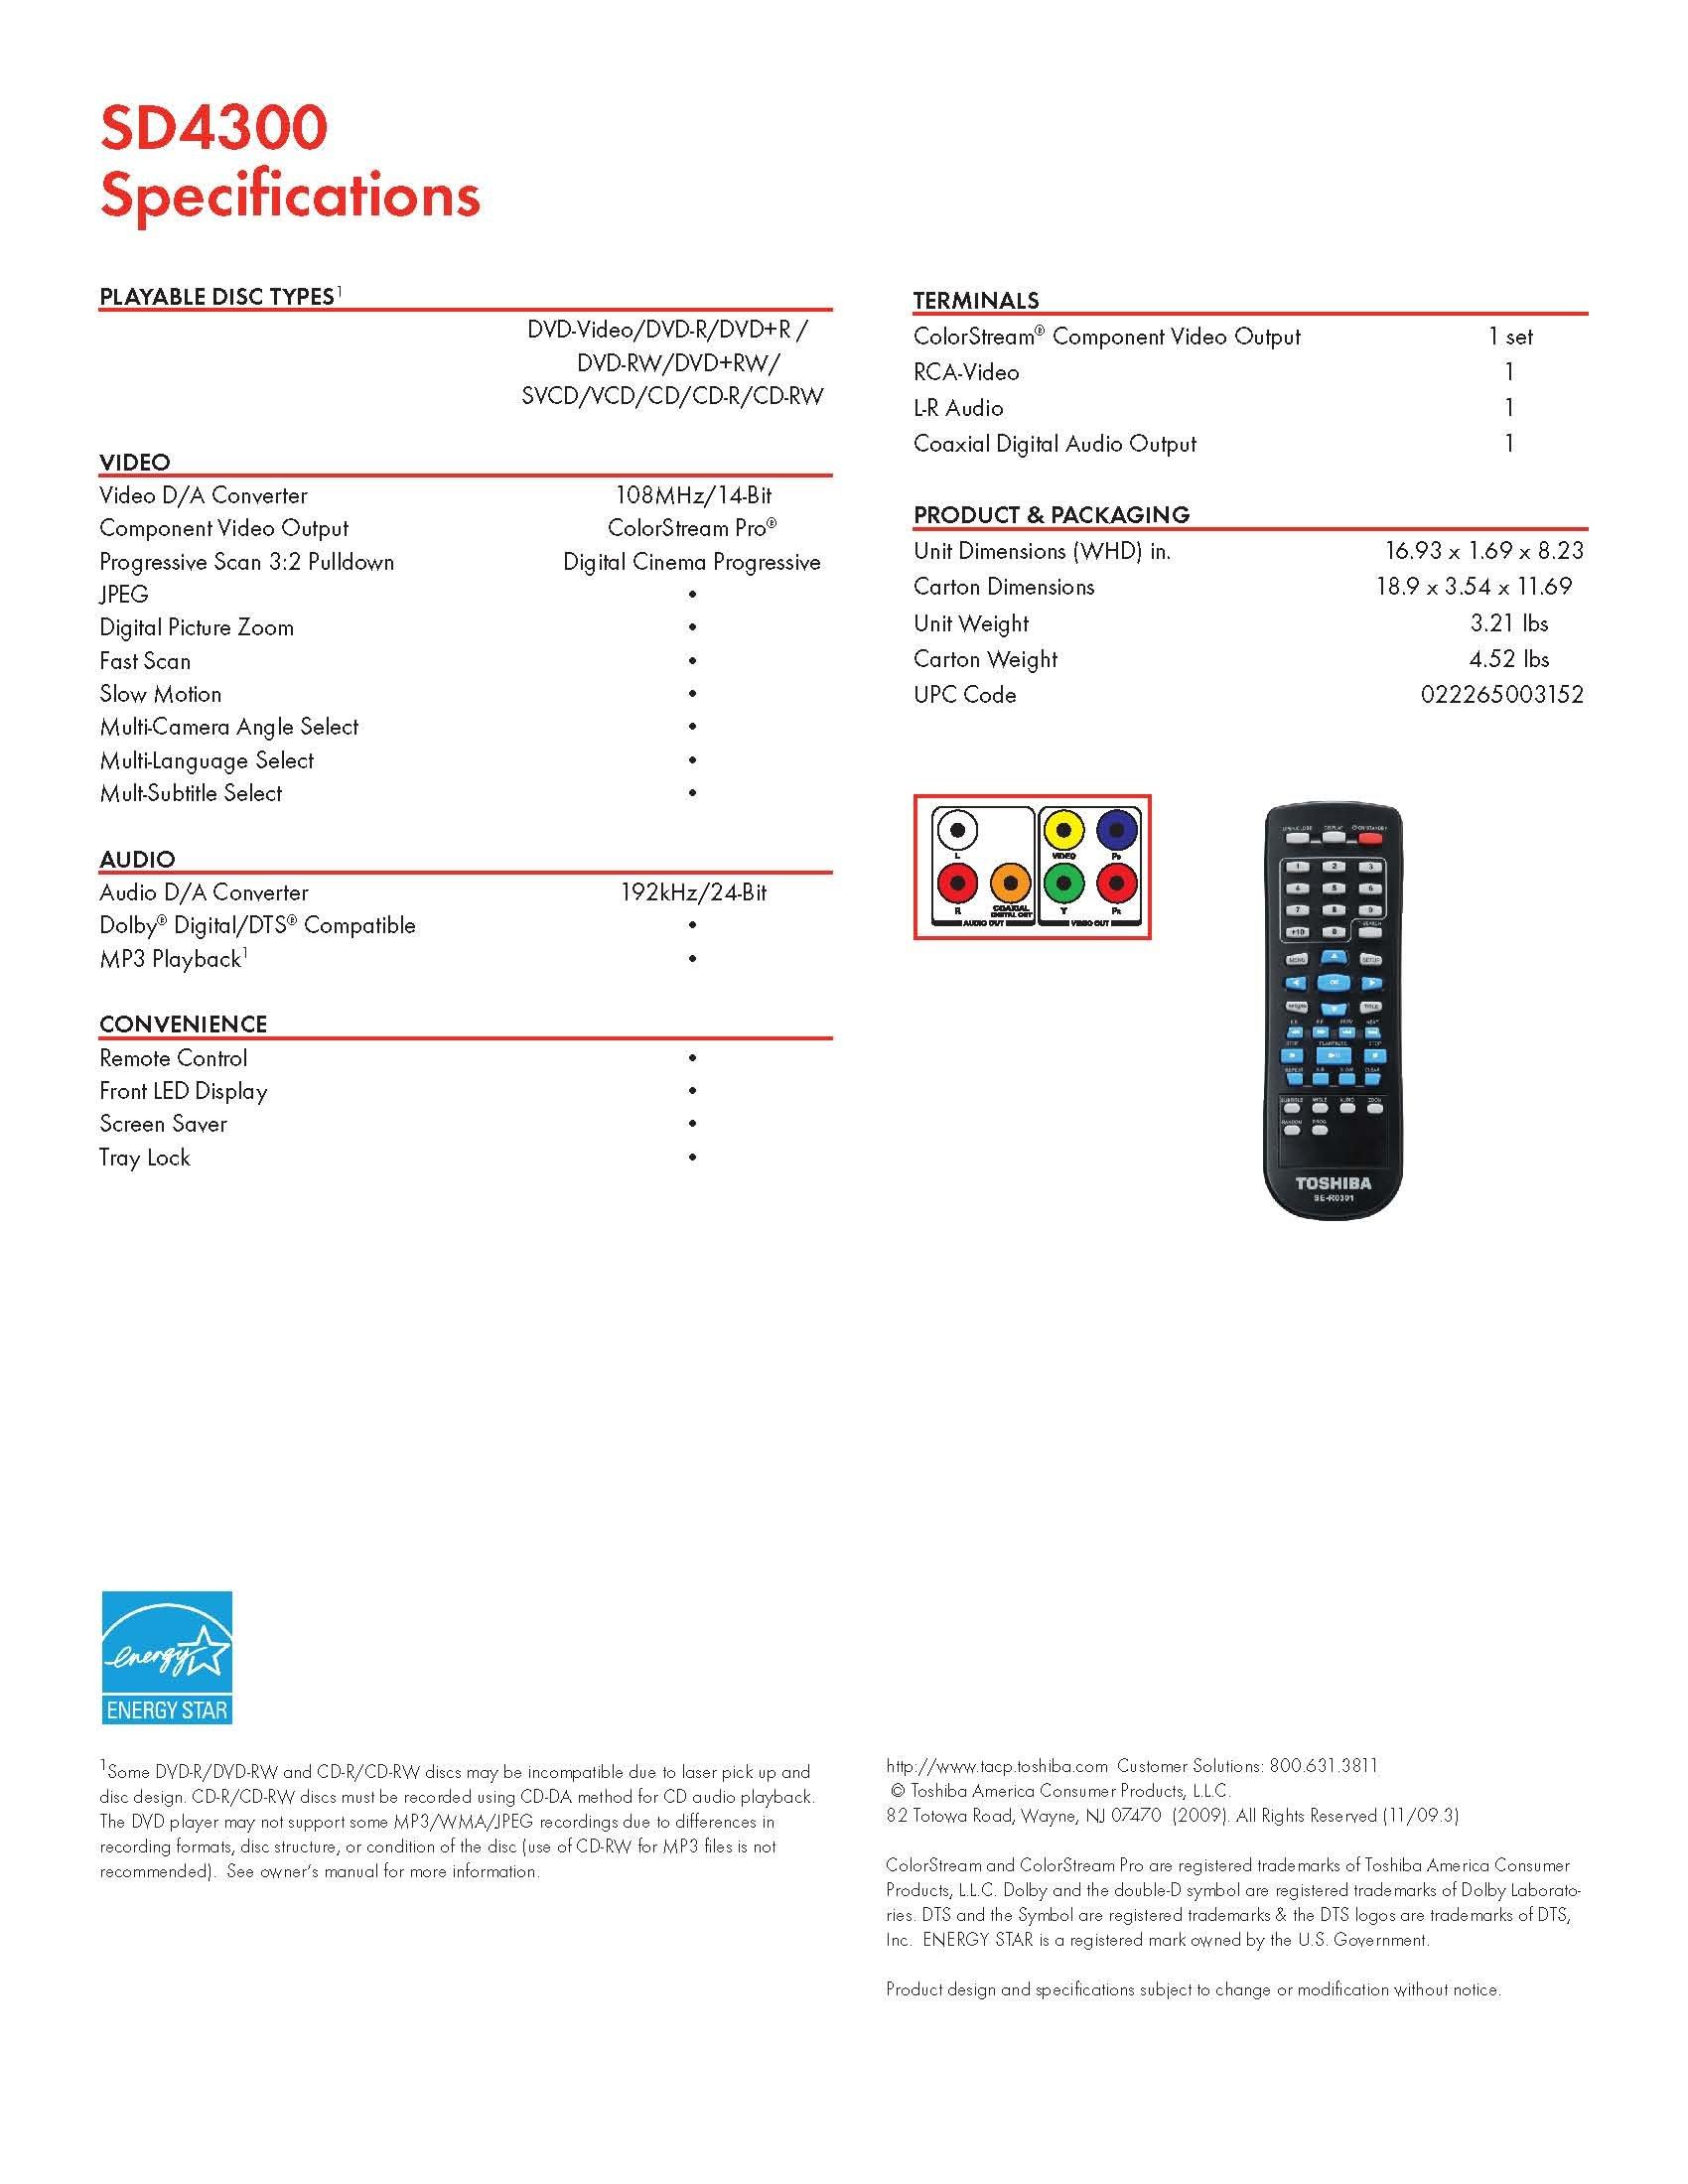 Toshiba SD4300 Progresive Scan DVD Player (Black)